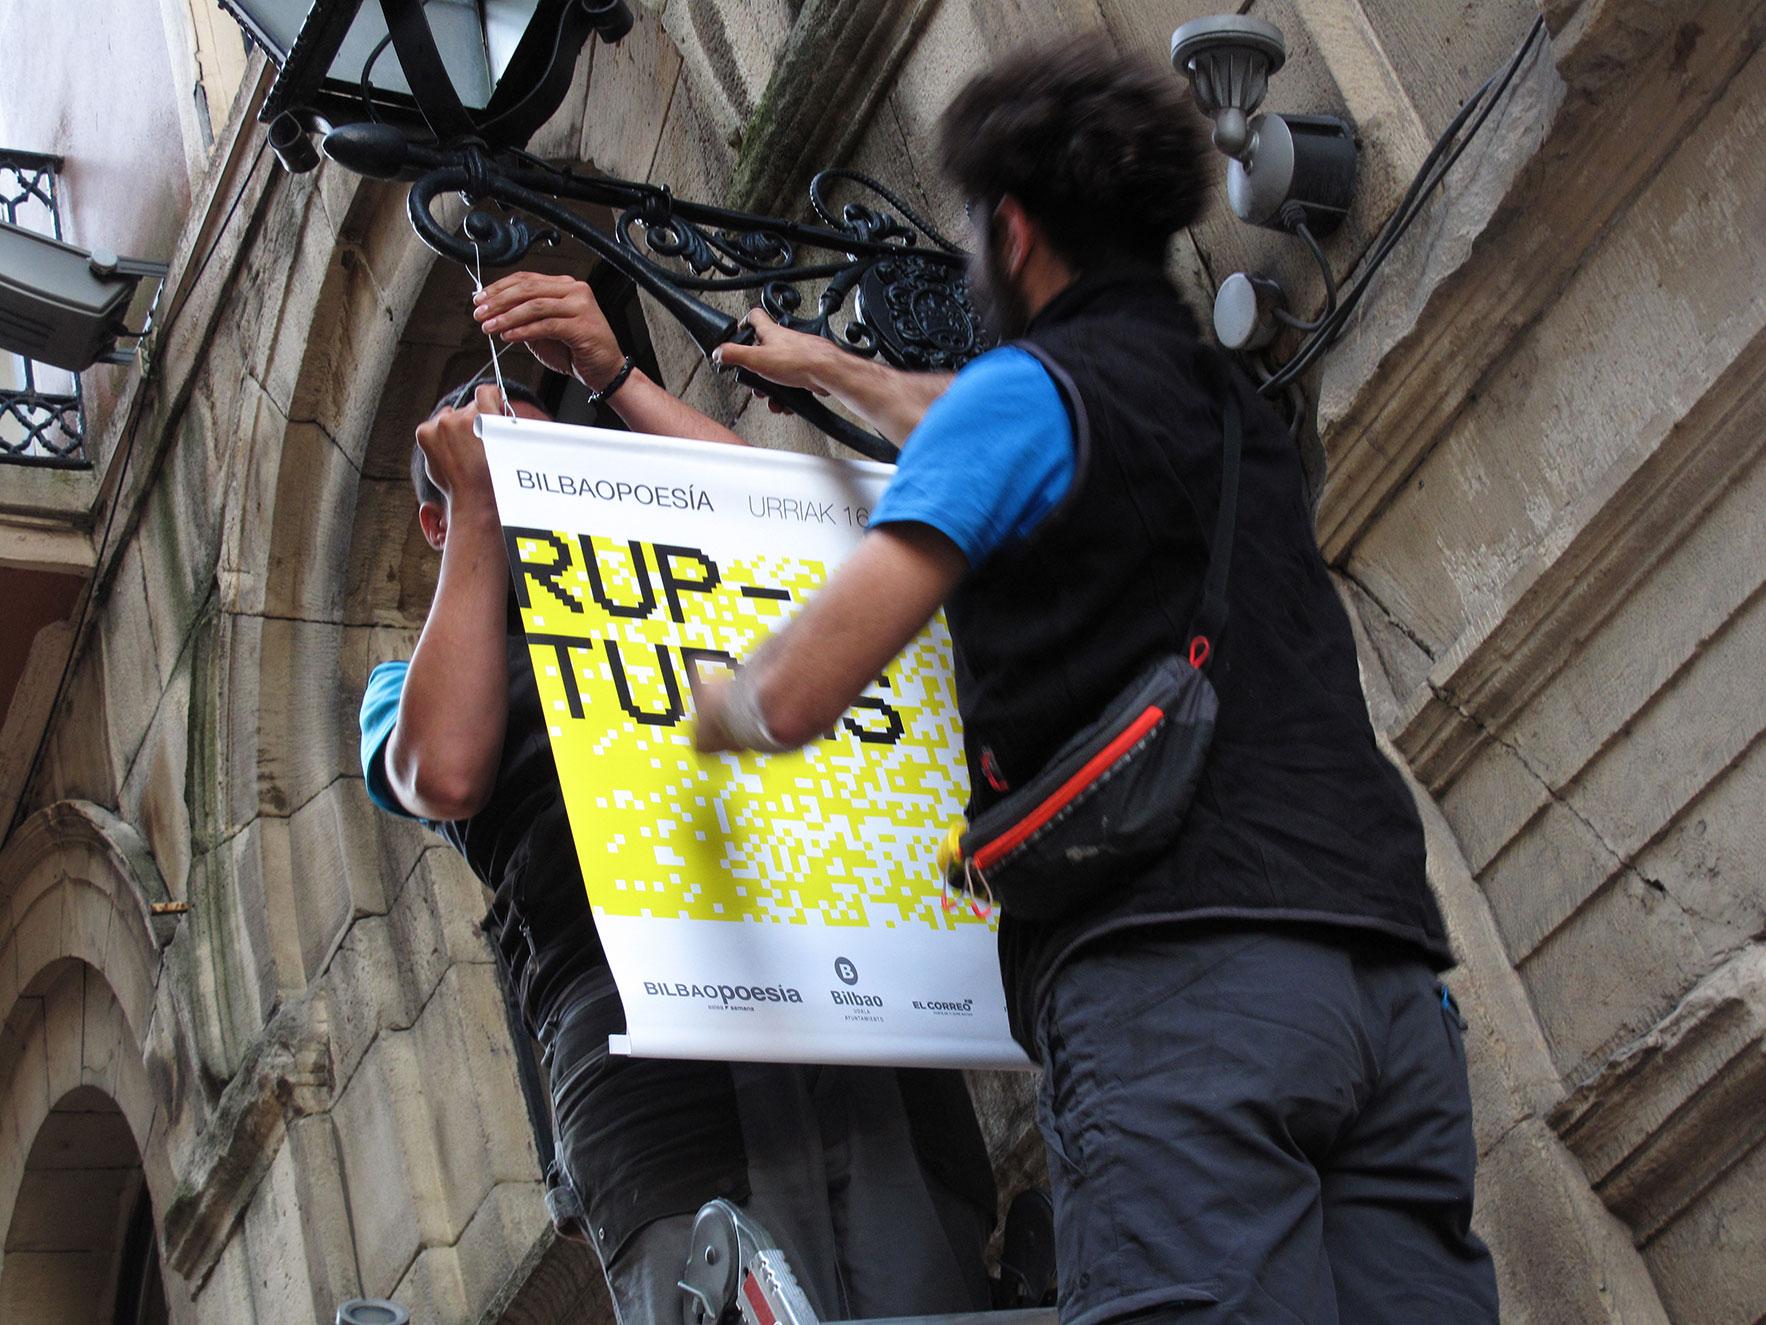 Bilbao poesía colocación carteles farola Bilbao